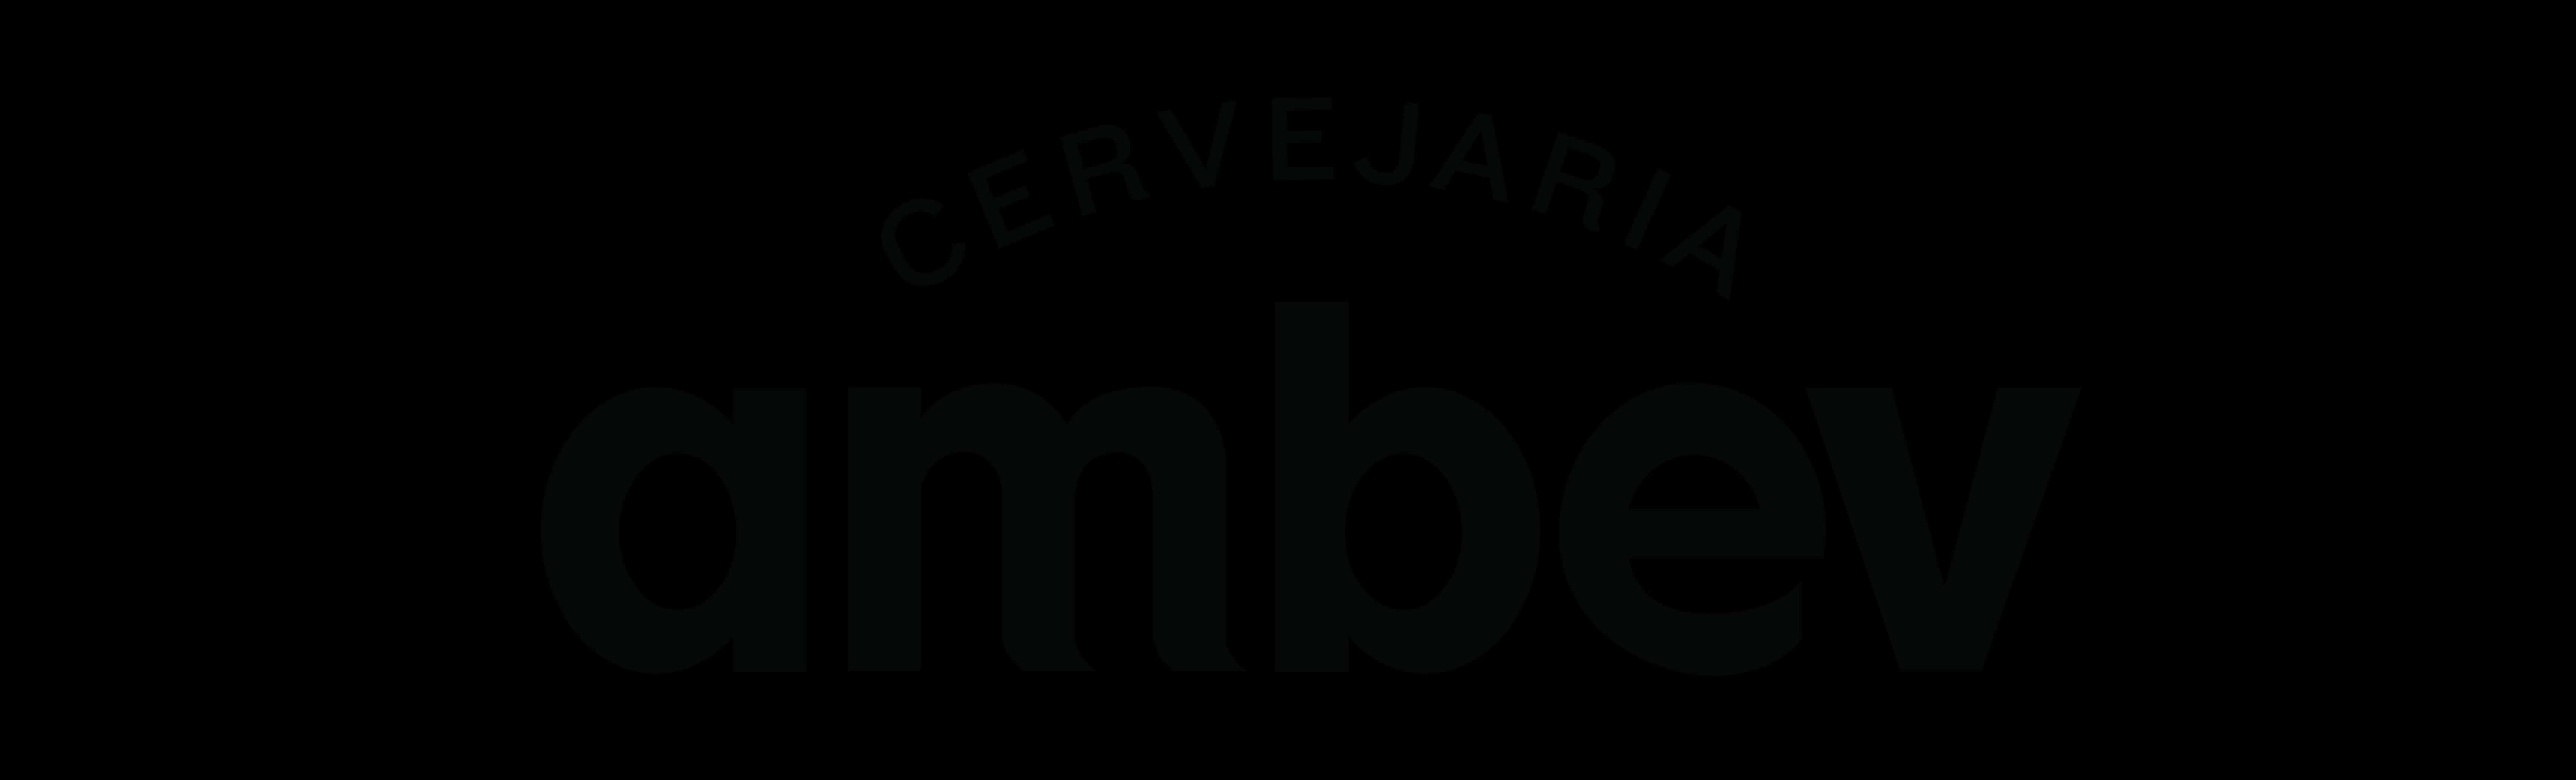 BANCO_Logística - Conferente (CDD CAMBORIU)